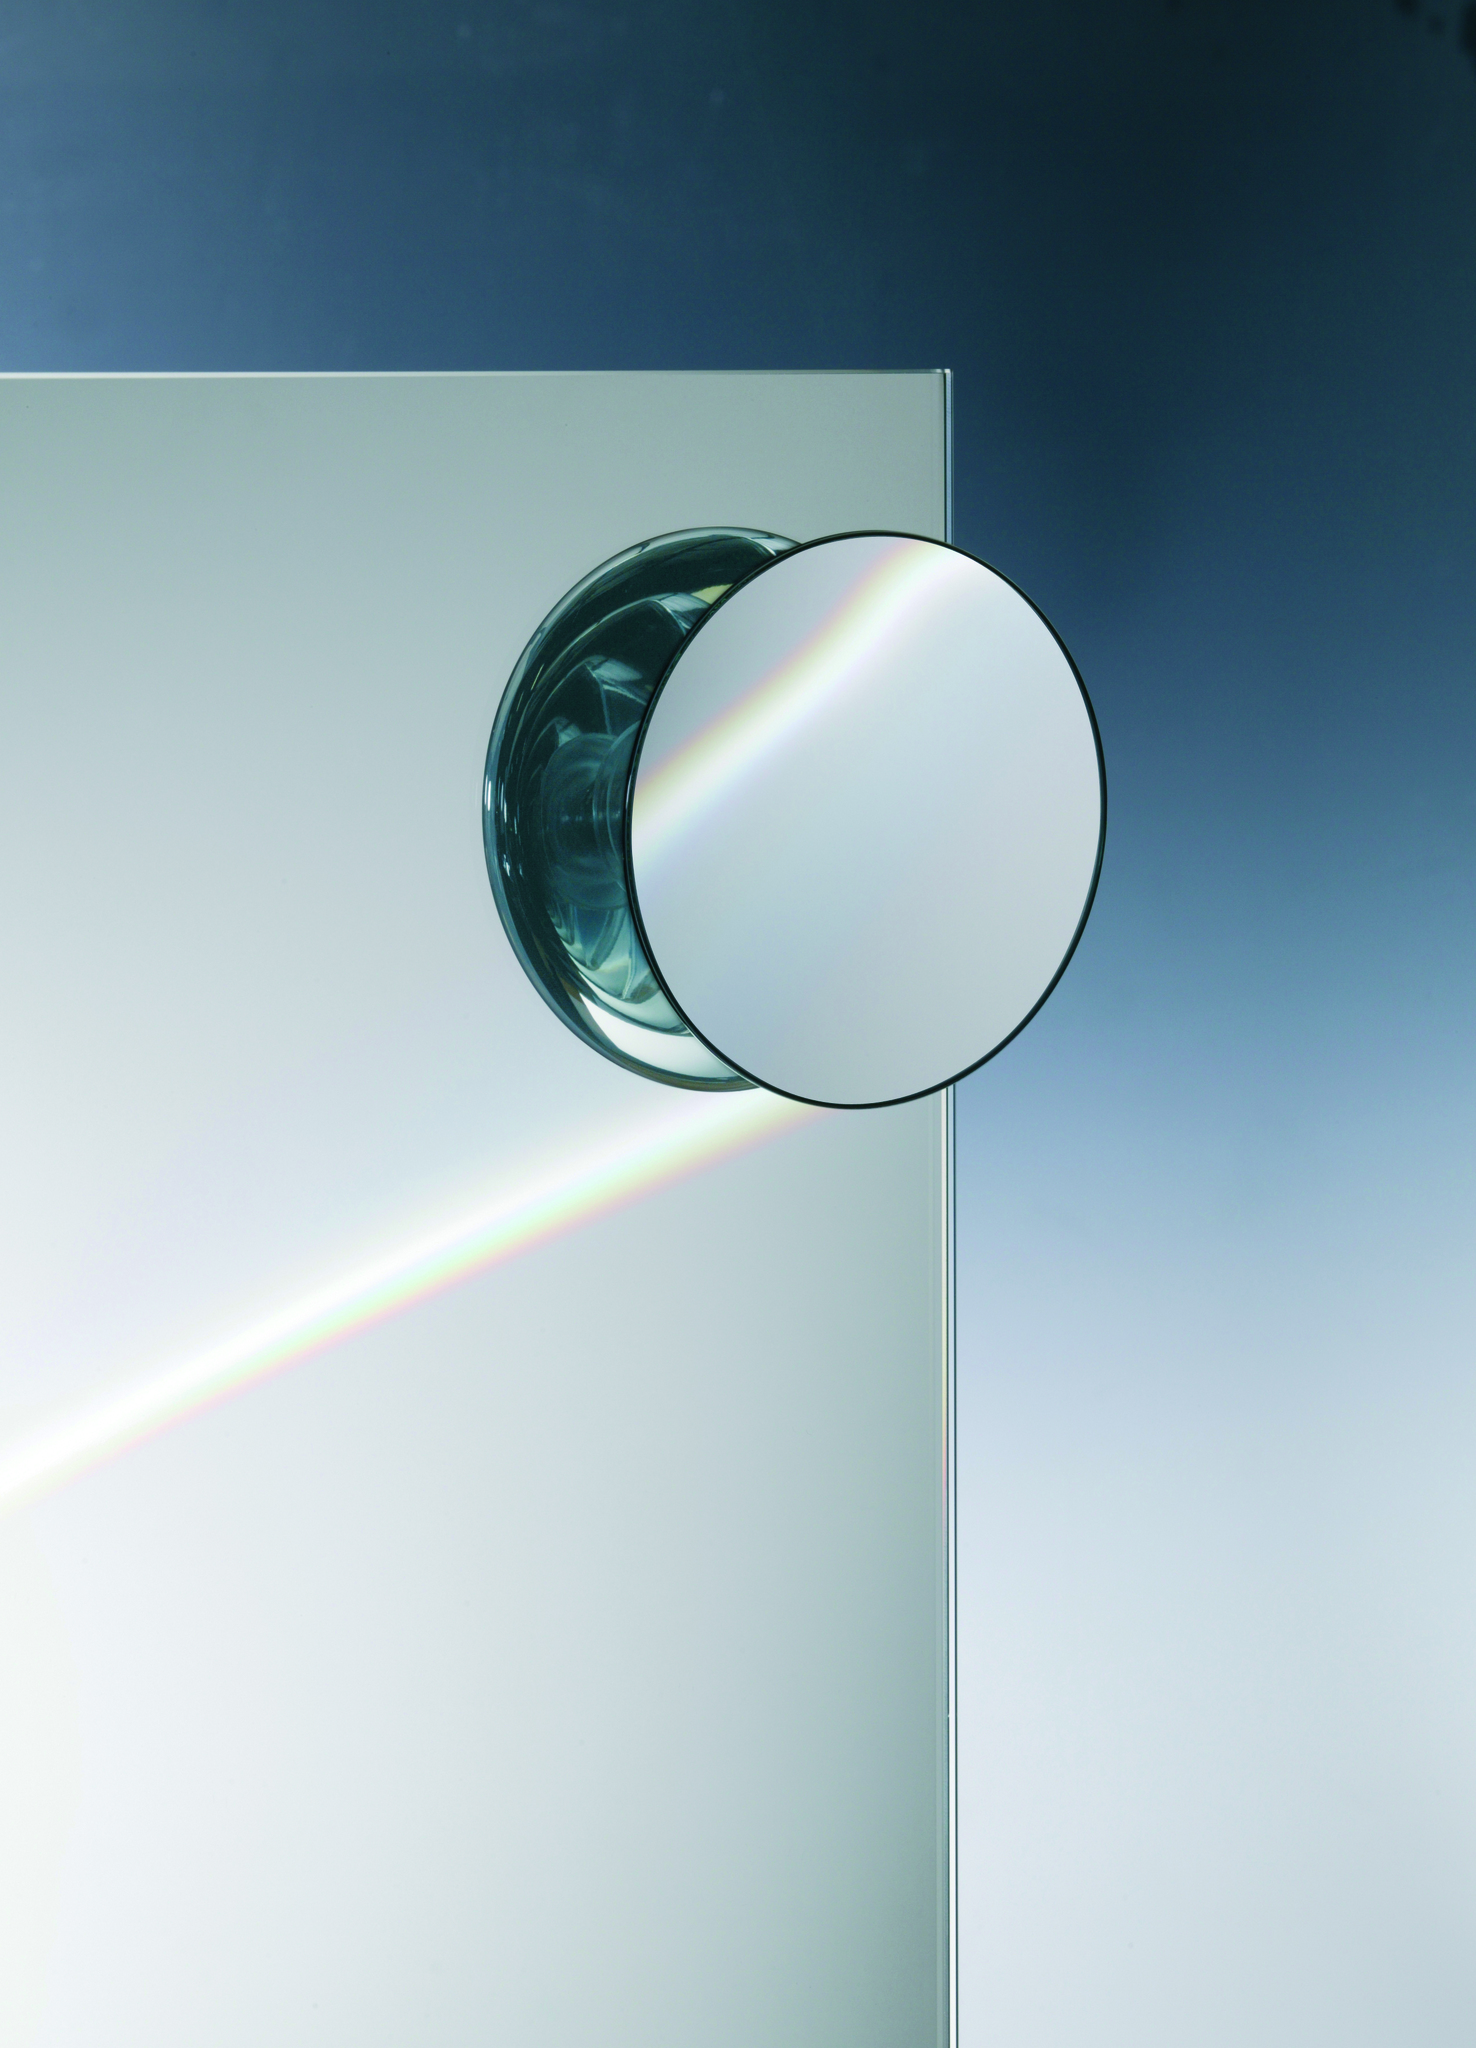 Зеркала Элитное зеркало косметическое на присосках 99302CR 5X от Windisch elitnoe-zerkalo-kosmeticheskoe-na-prisoskah-99302-ot-windisch-ispaniya.jpg